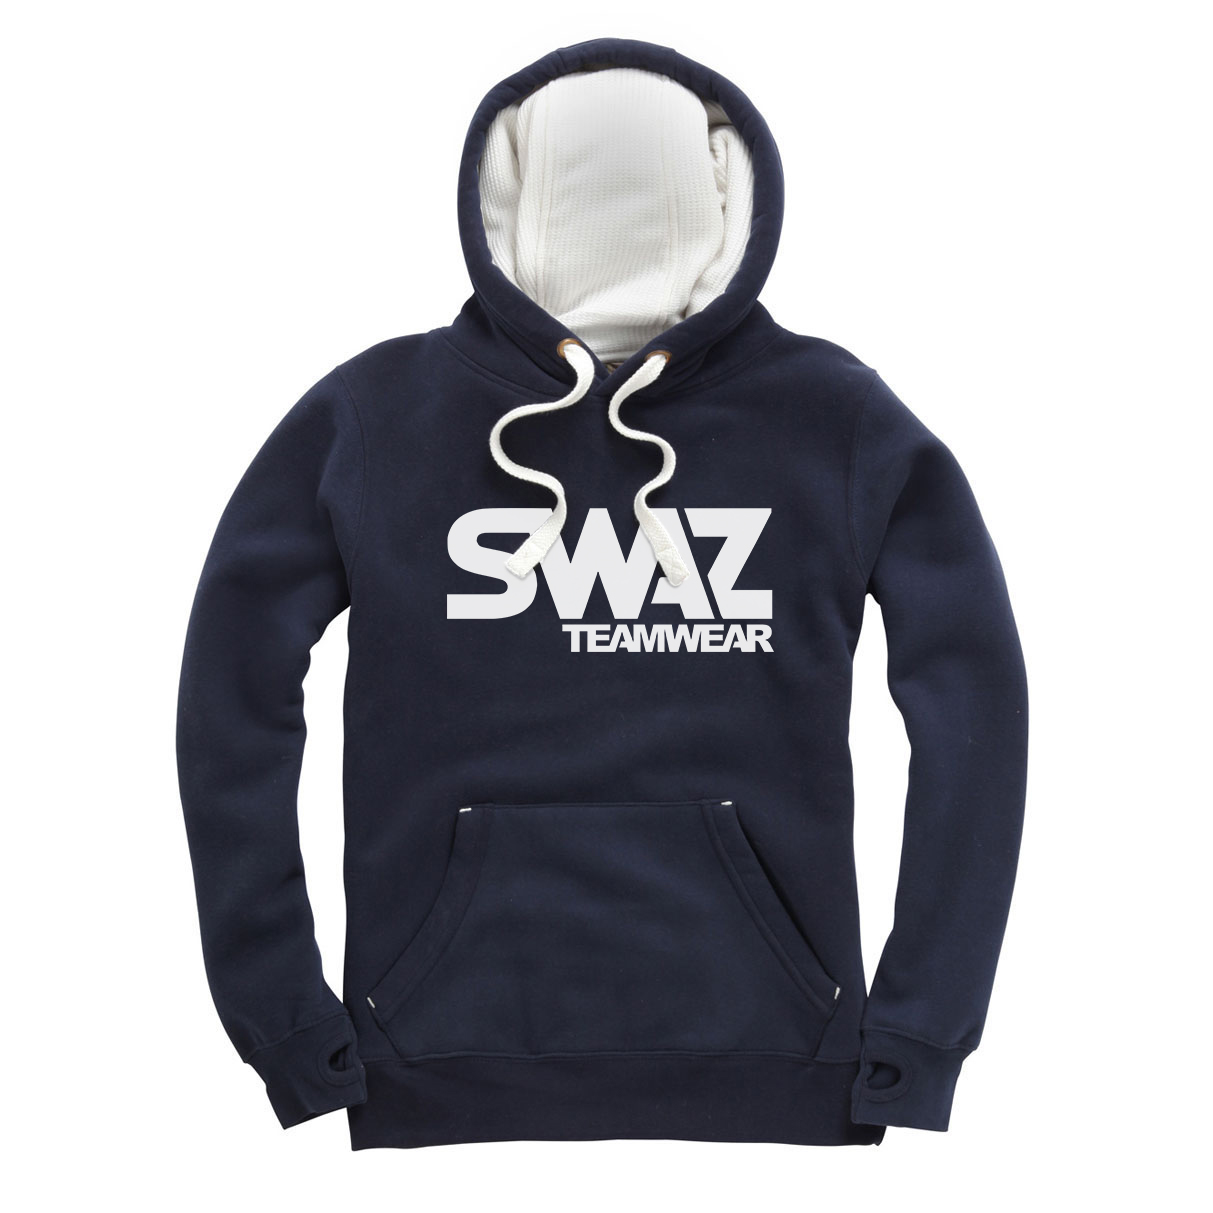 SWAZ Teamwear Classic Hoody – Safe Blue